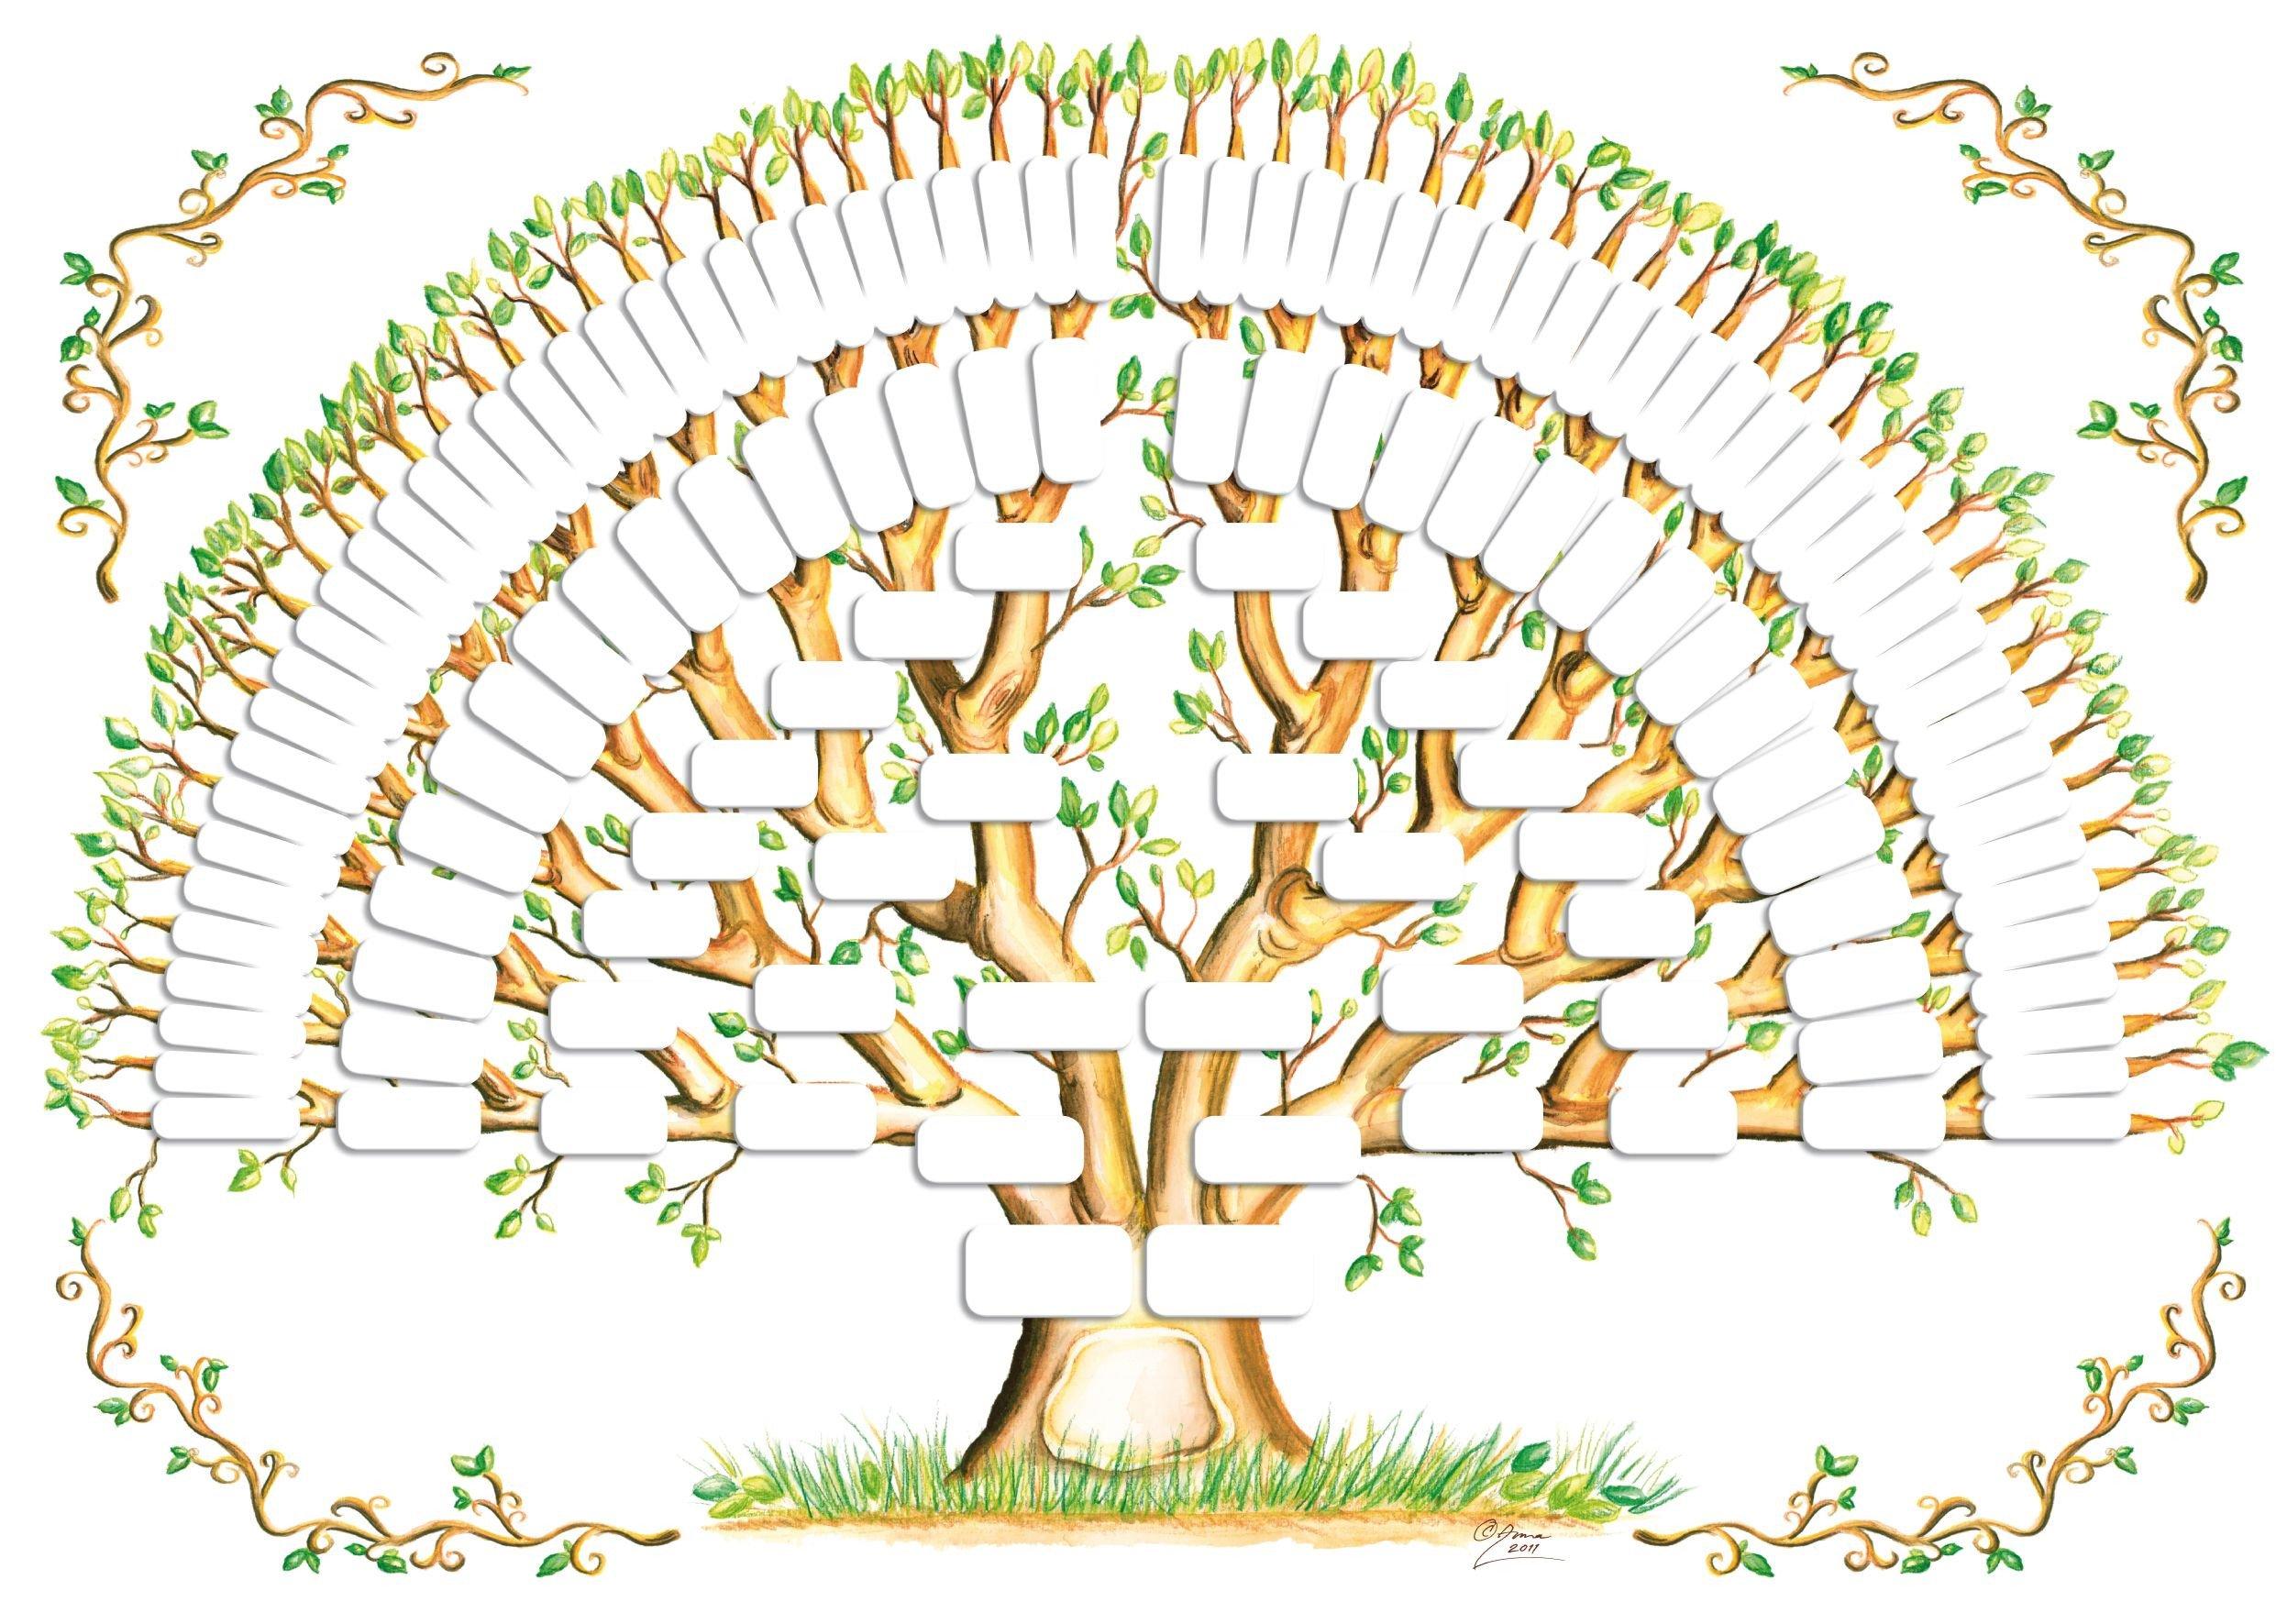 8 Generation Family Tree Template 5 Generation Family Tree Template Tree Gallery